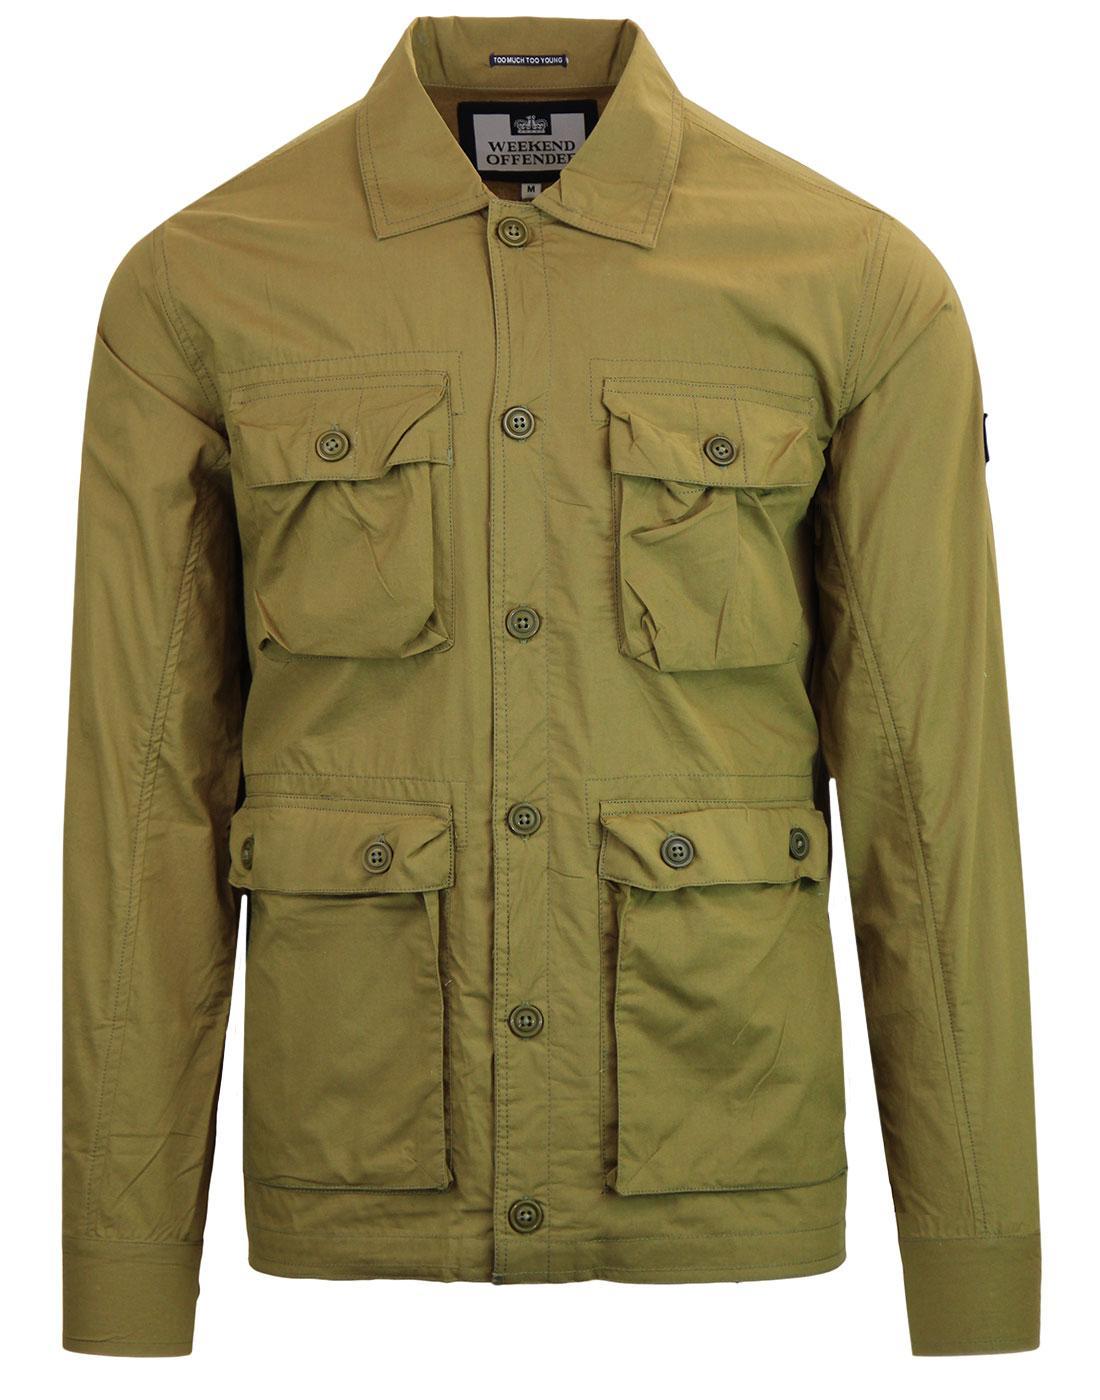 Salinger WEEKEND OFFENDER 90s Military Jacket (O)